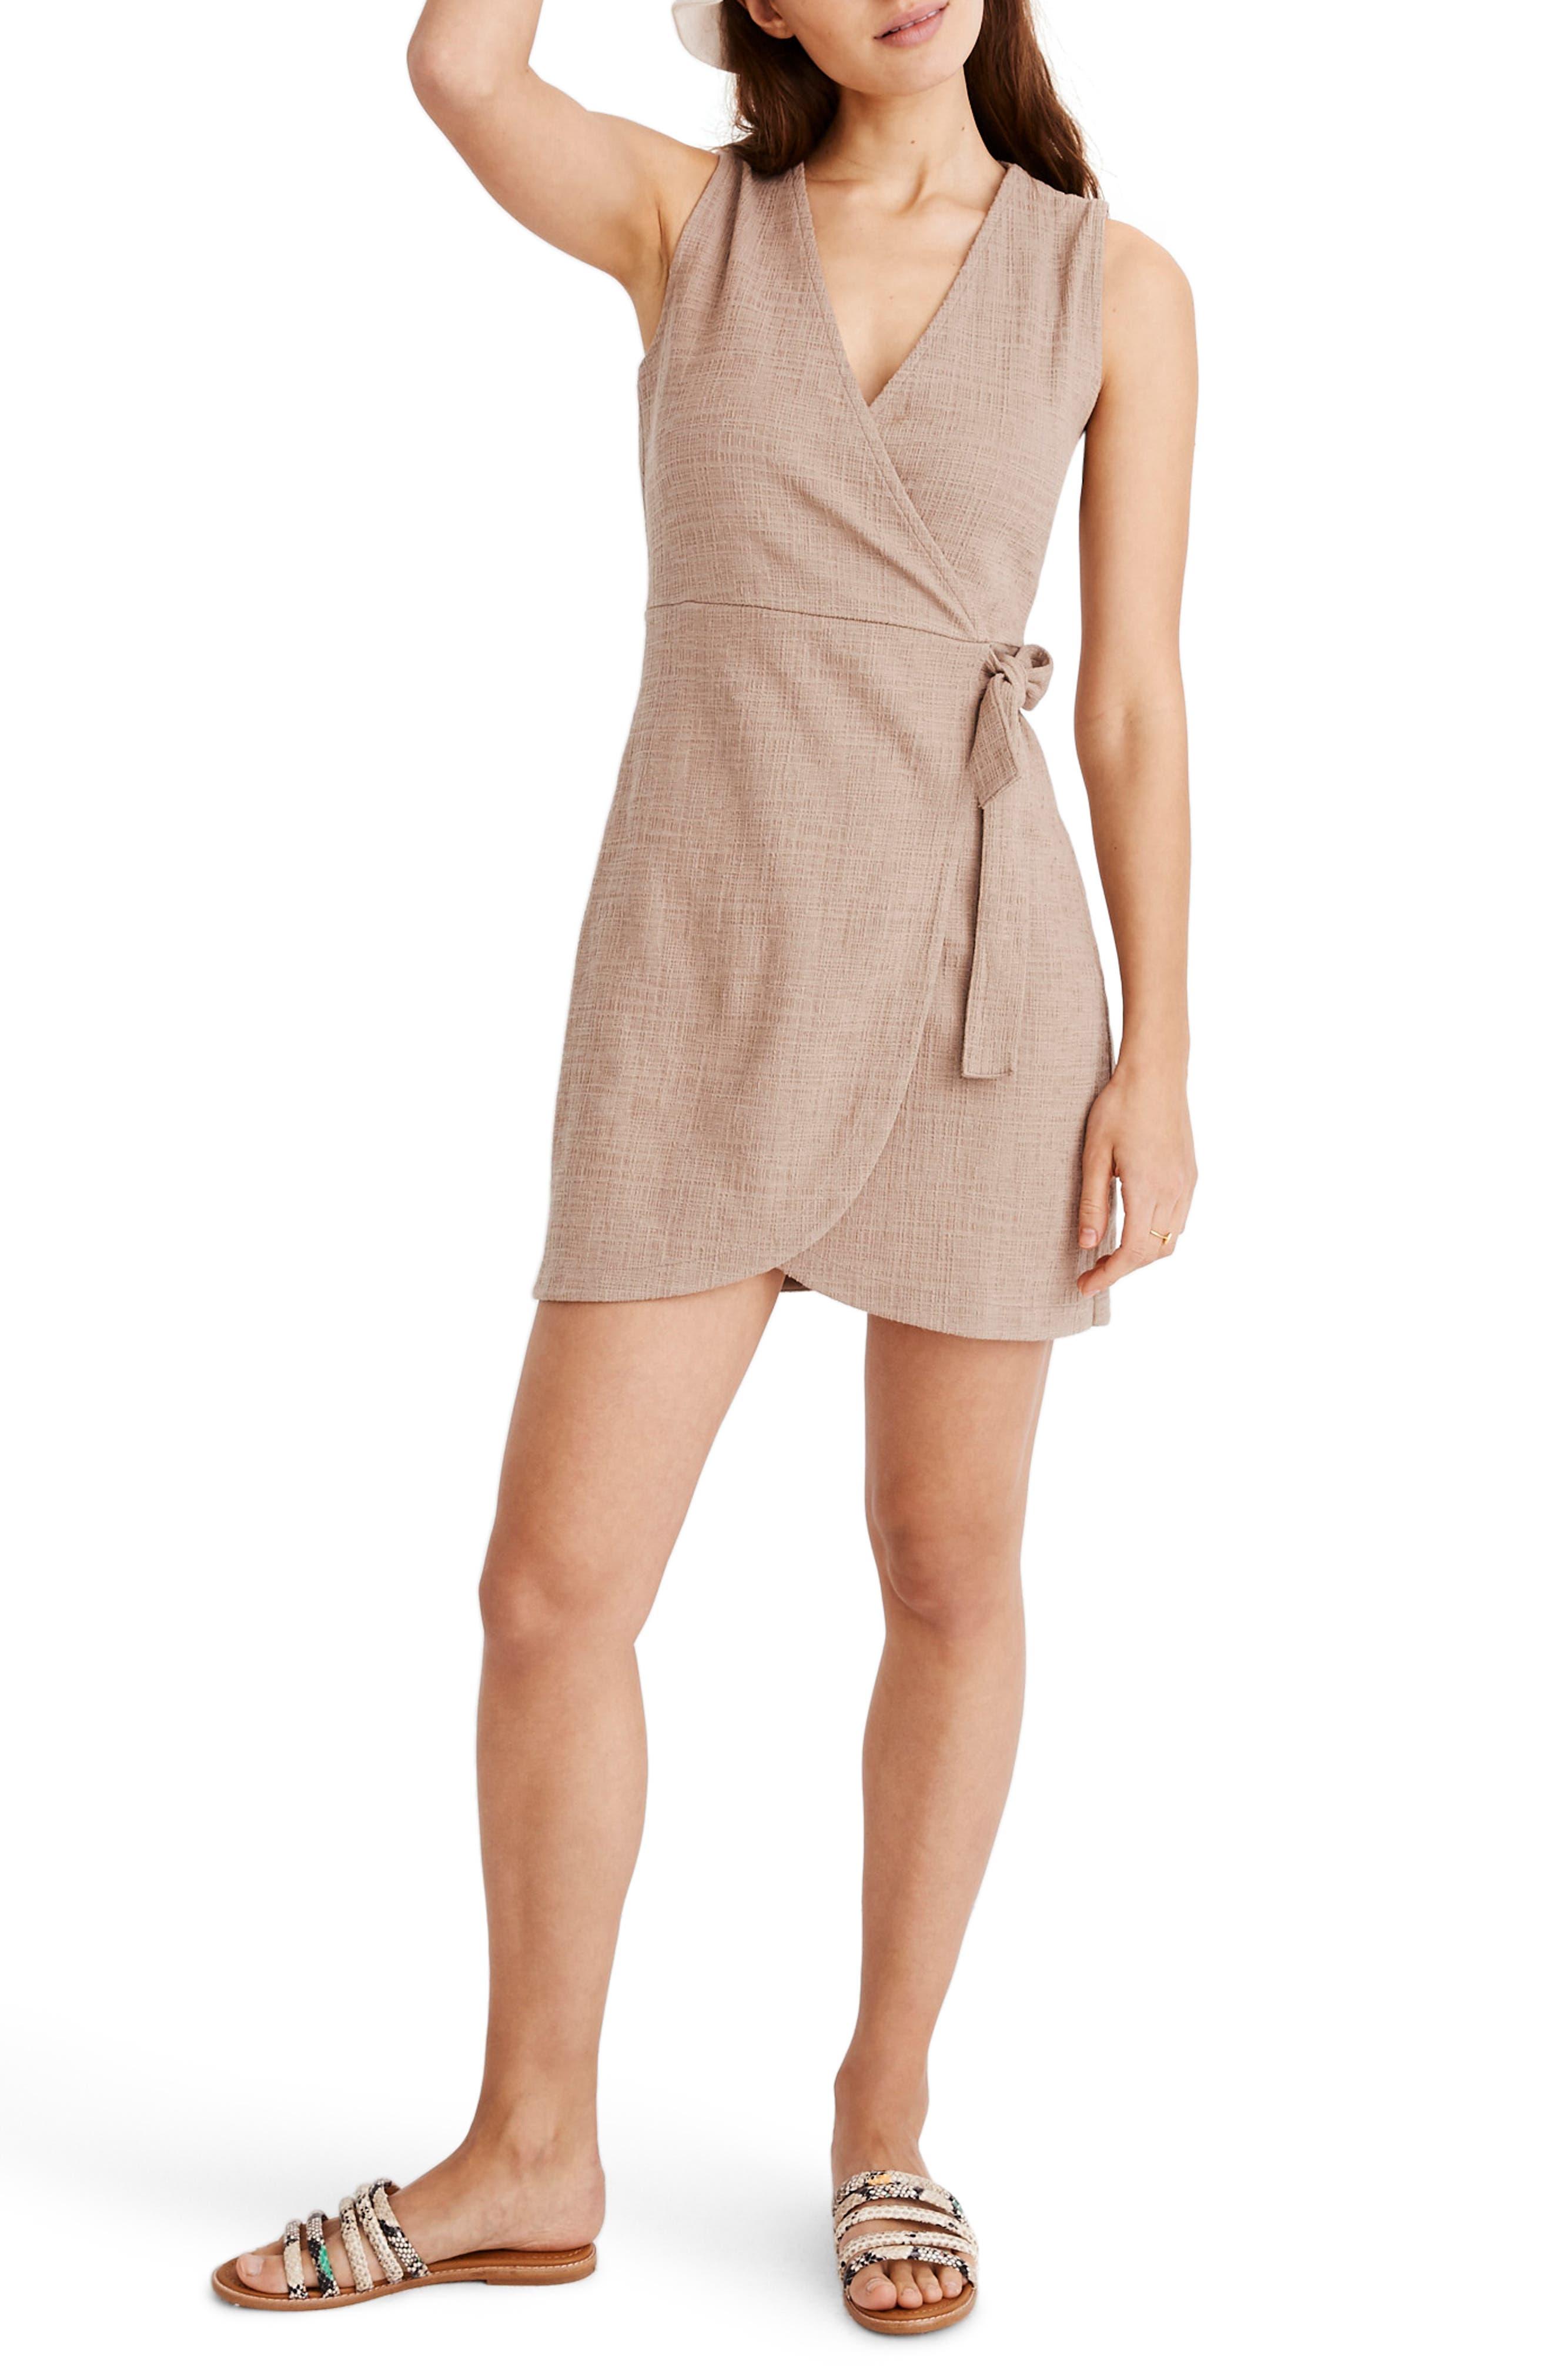 Madewell Texture & Thread Side Tie Minidress, Beige